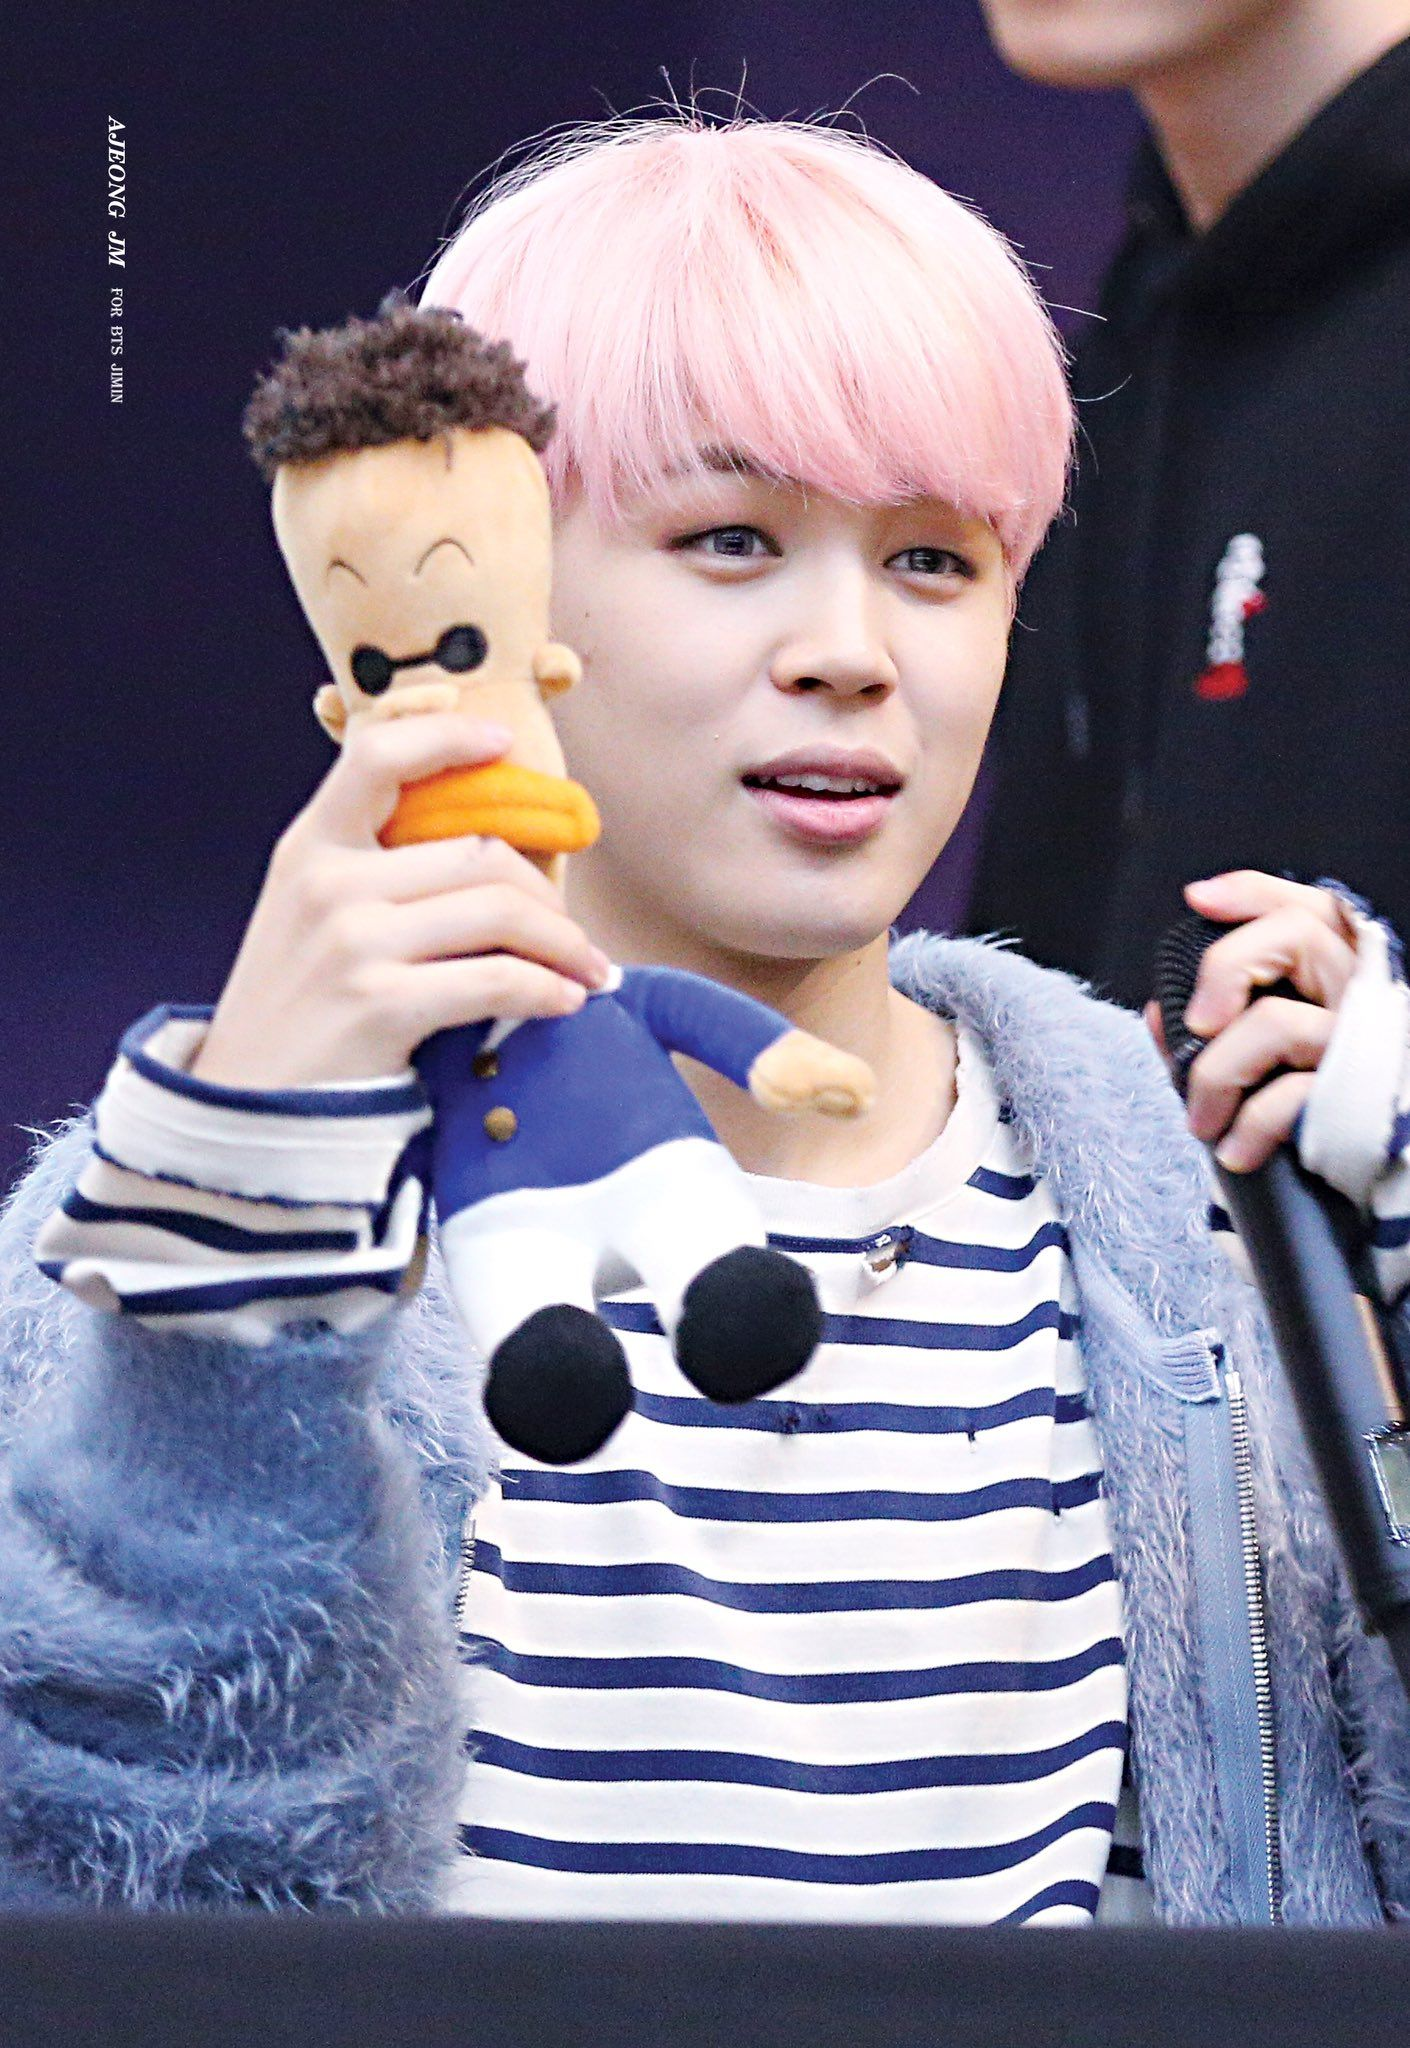 "AJEONG_JM💫 on Twitter: ""170224 목동 팬싸 HD 🍎 #방탄소년단 #JIMIN #지민 @BTS_twt https://t.co/rqbOEMnnDr"""